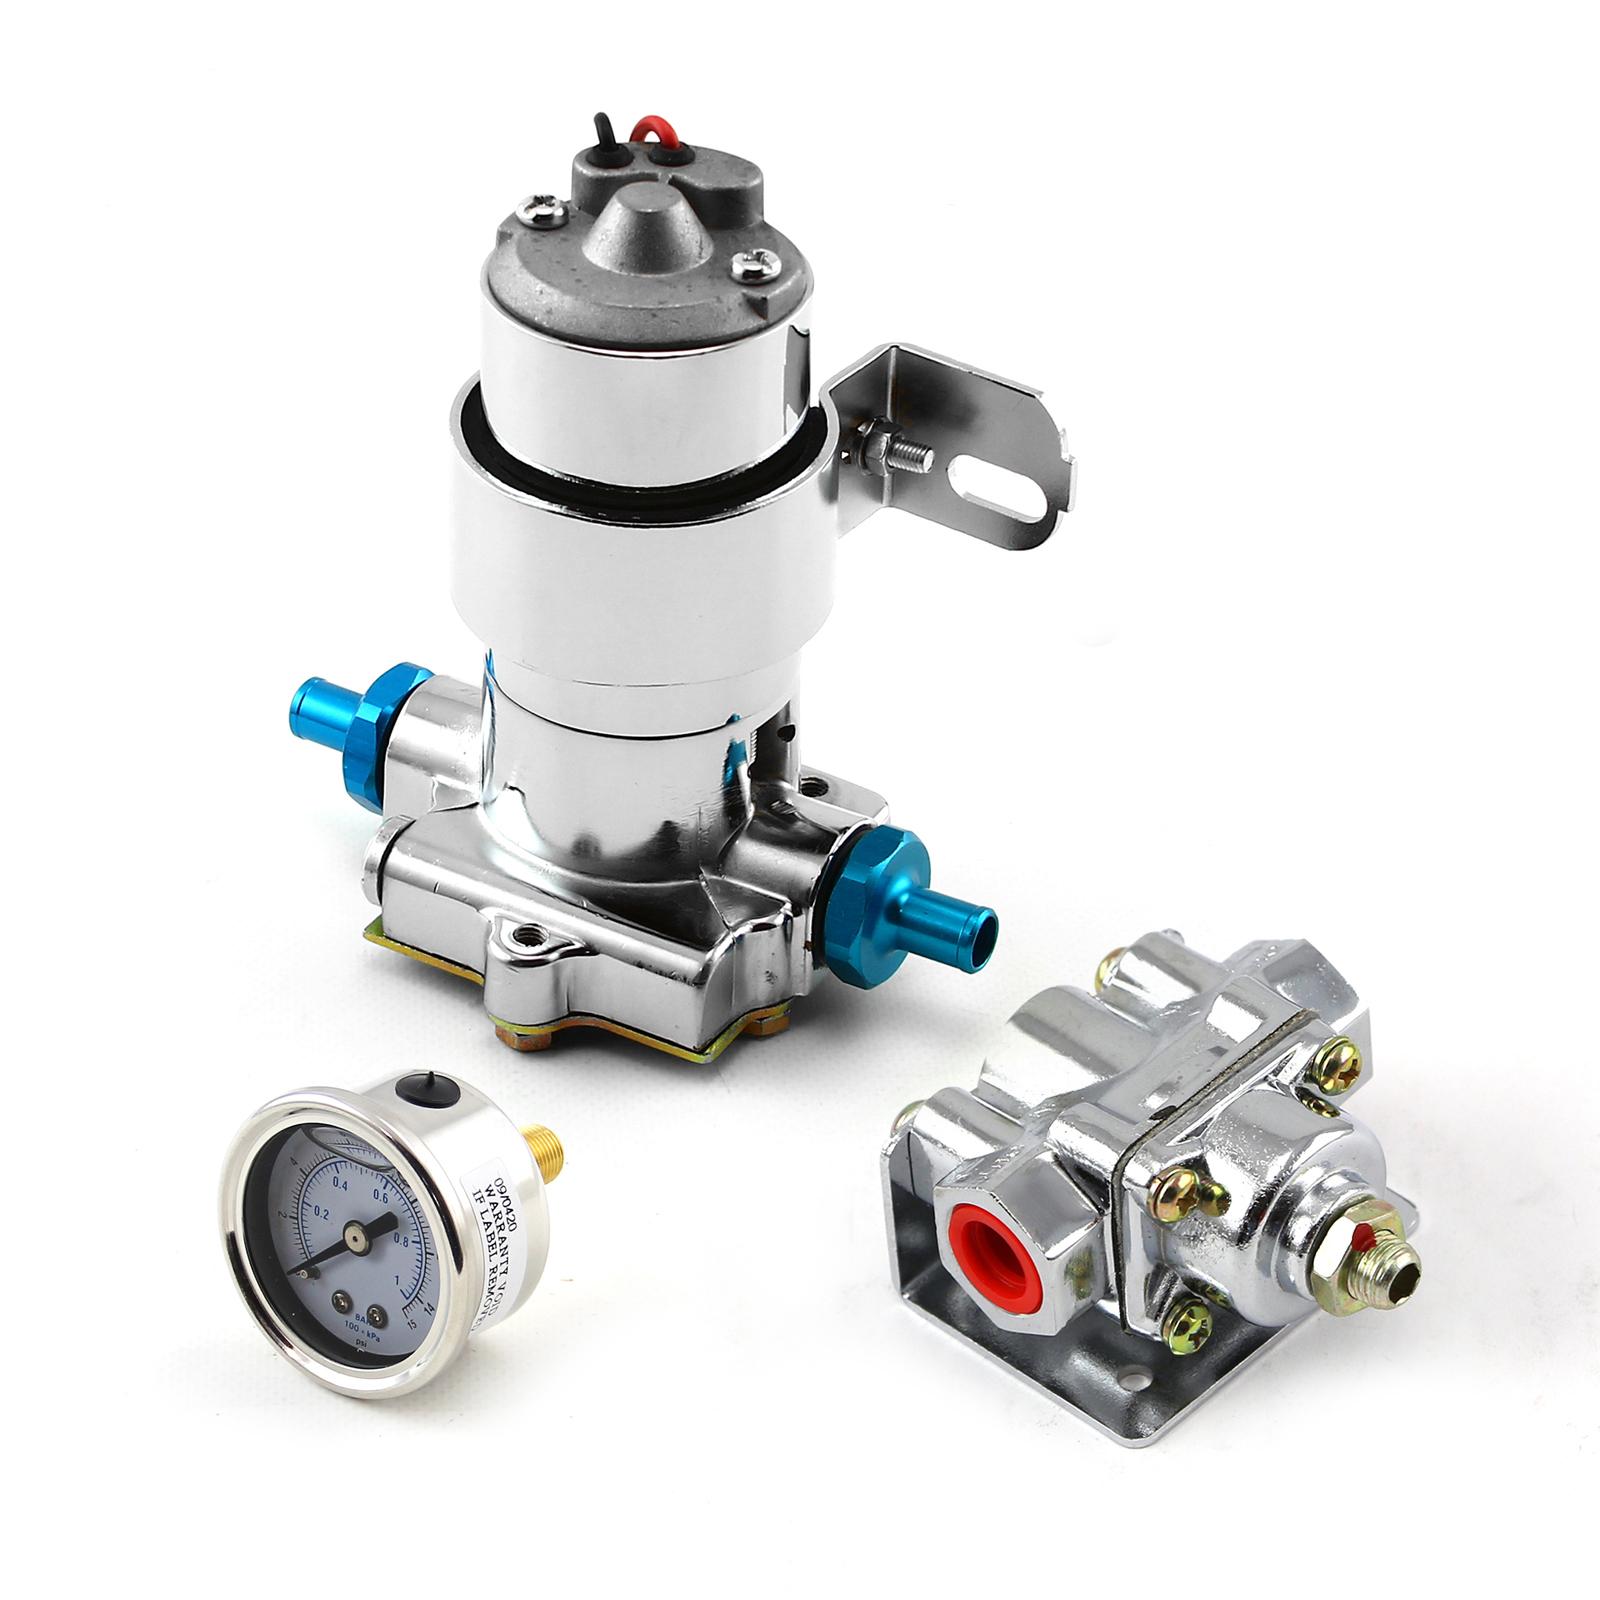 140 Gph Universal Chrome Electric Fuel Pump Regulator & Gauge Combo Kit